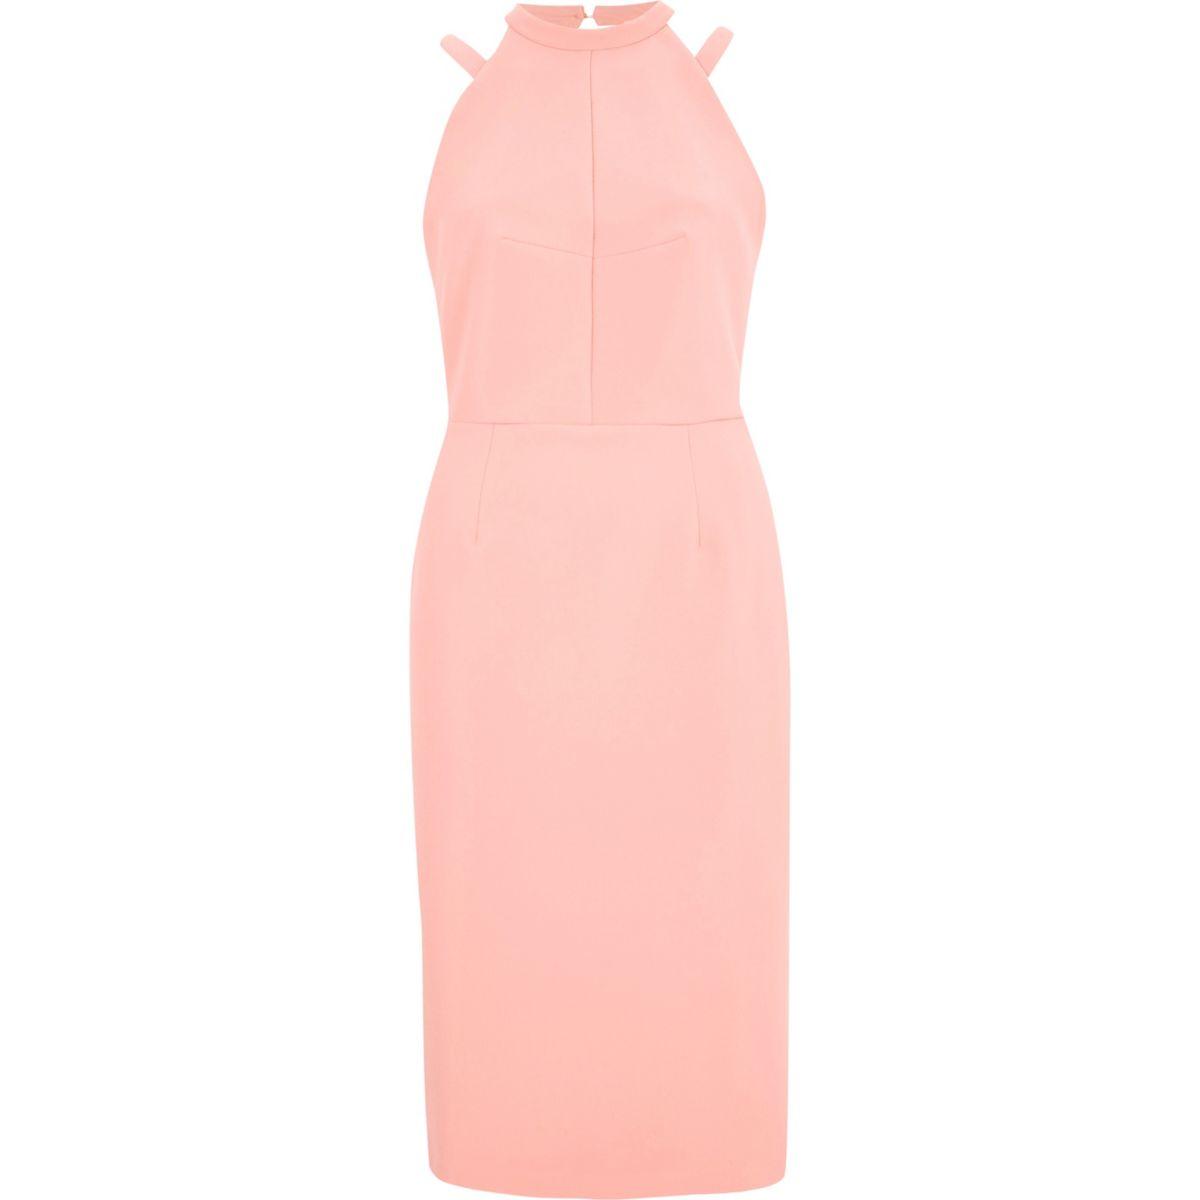 Light pink bow back midi bodycon dress